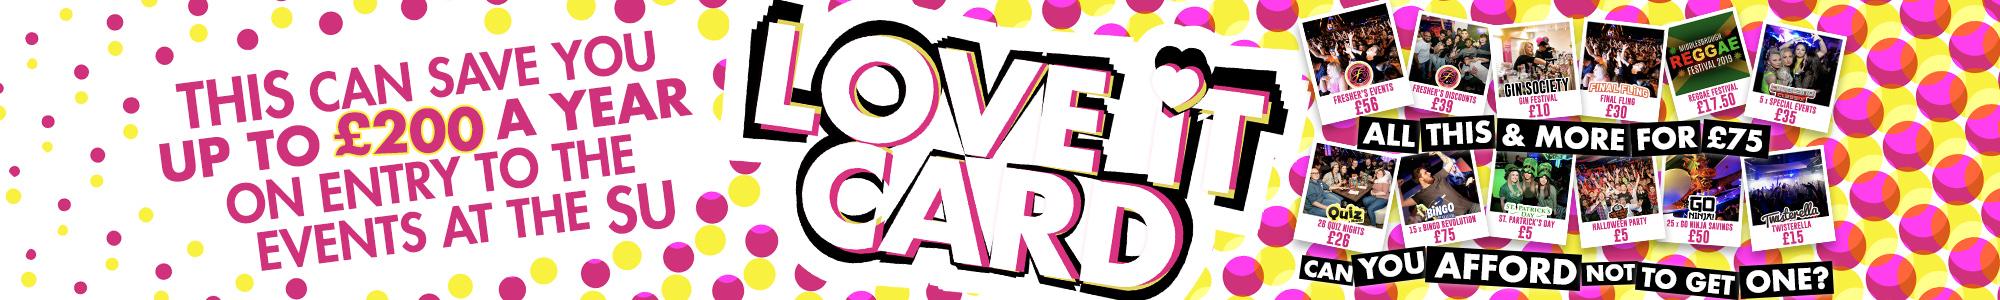 Love it card web banner